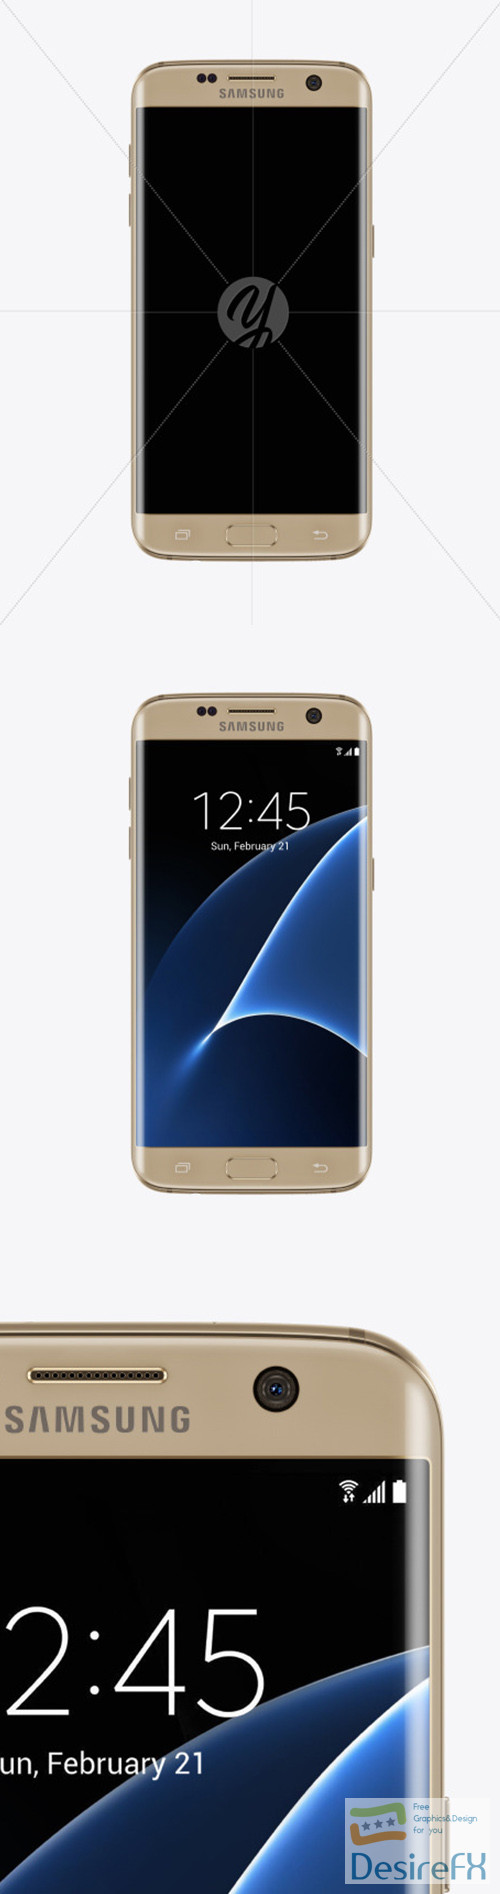 mock-up - Gold Platinum Samsung Galaxy S7 Phone Mockup 52107 TIF